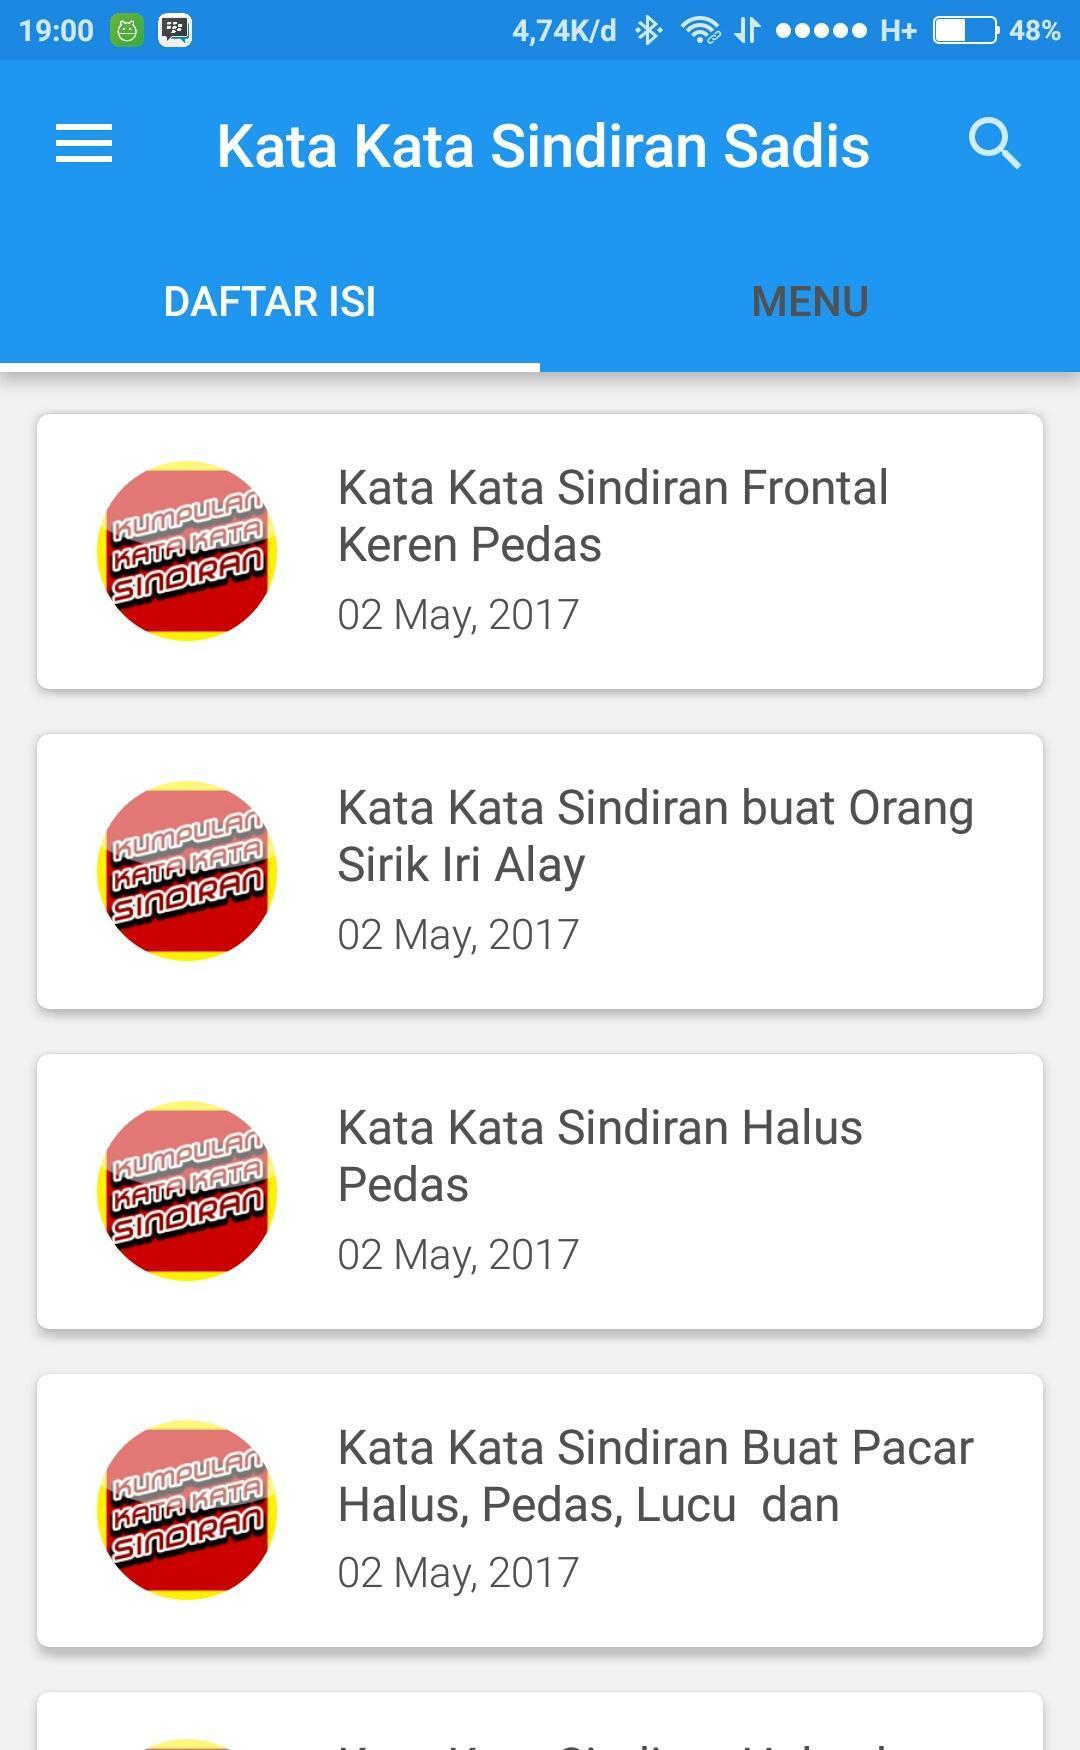 Kata Kata Sindiran Sadis For Android Apk Download